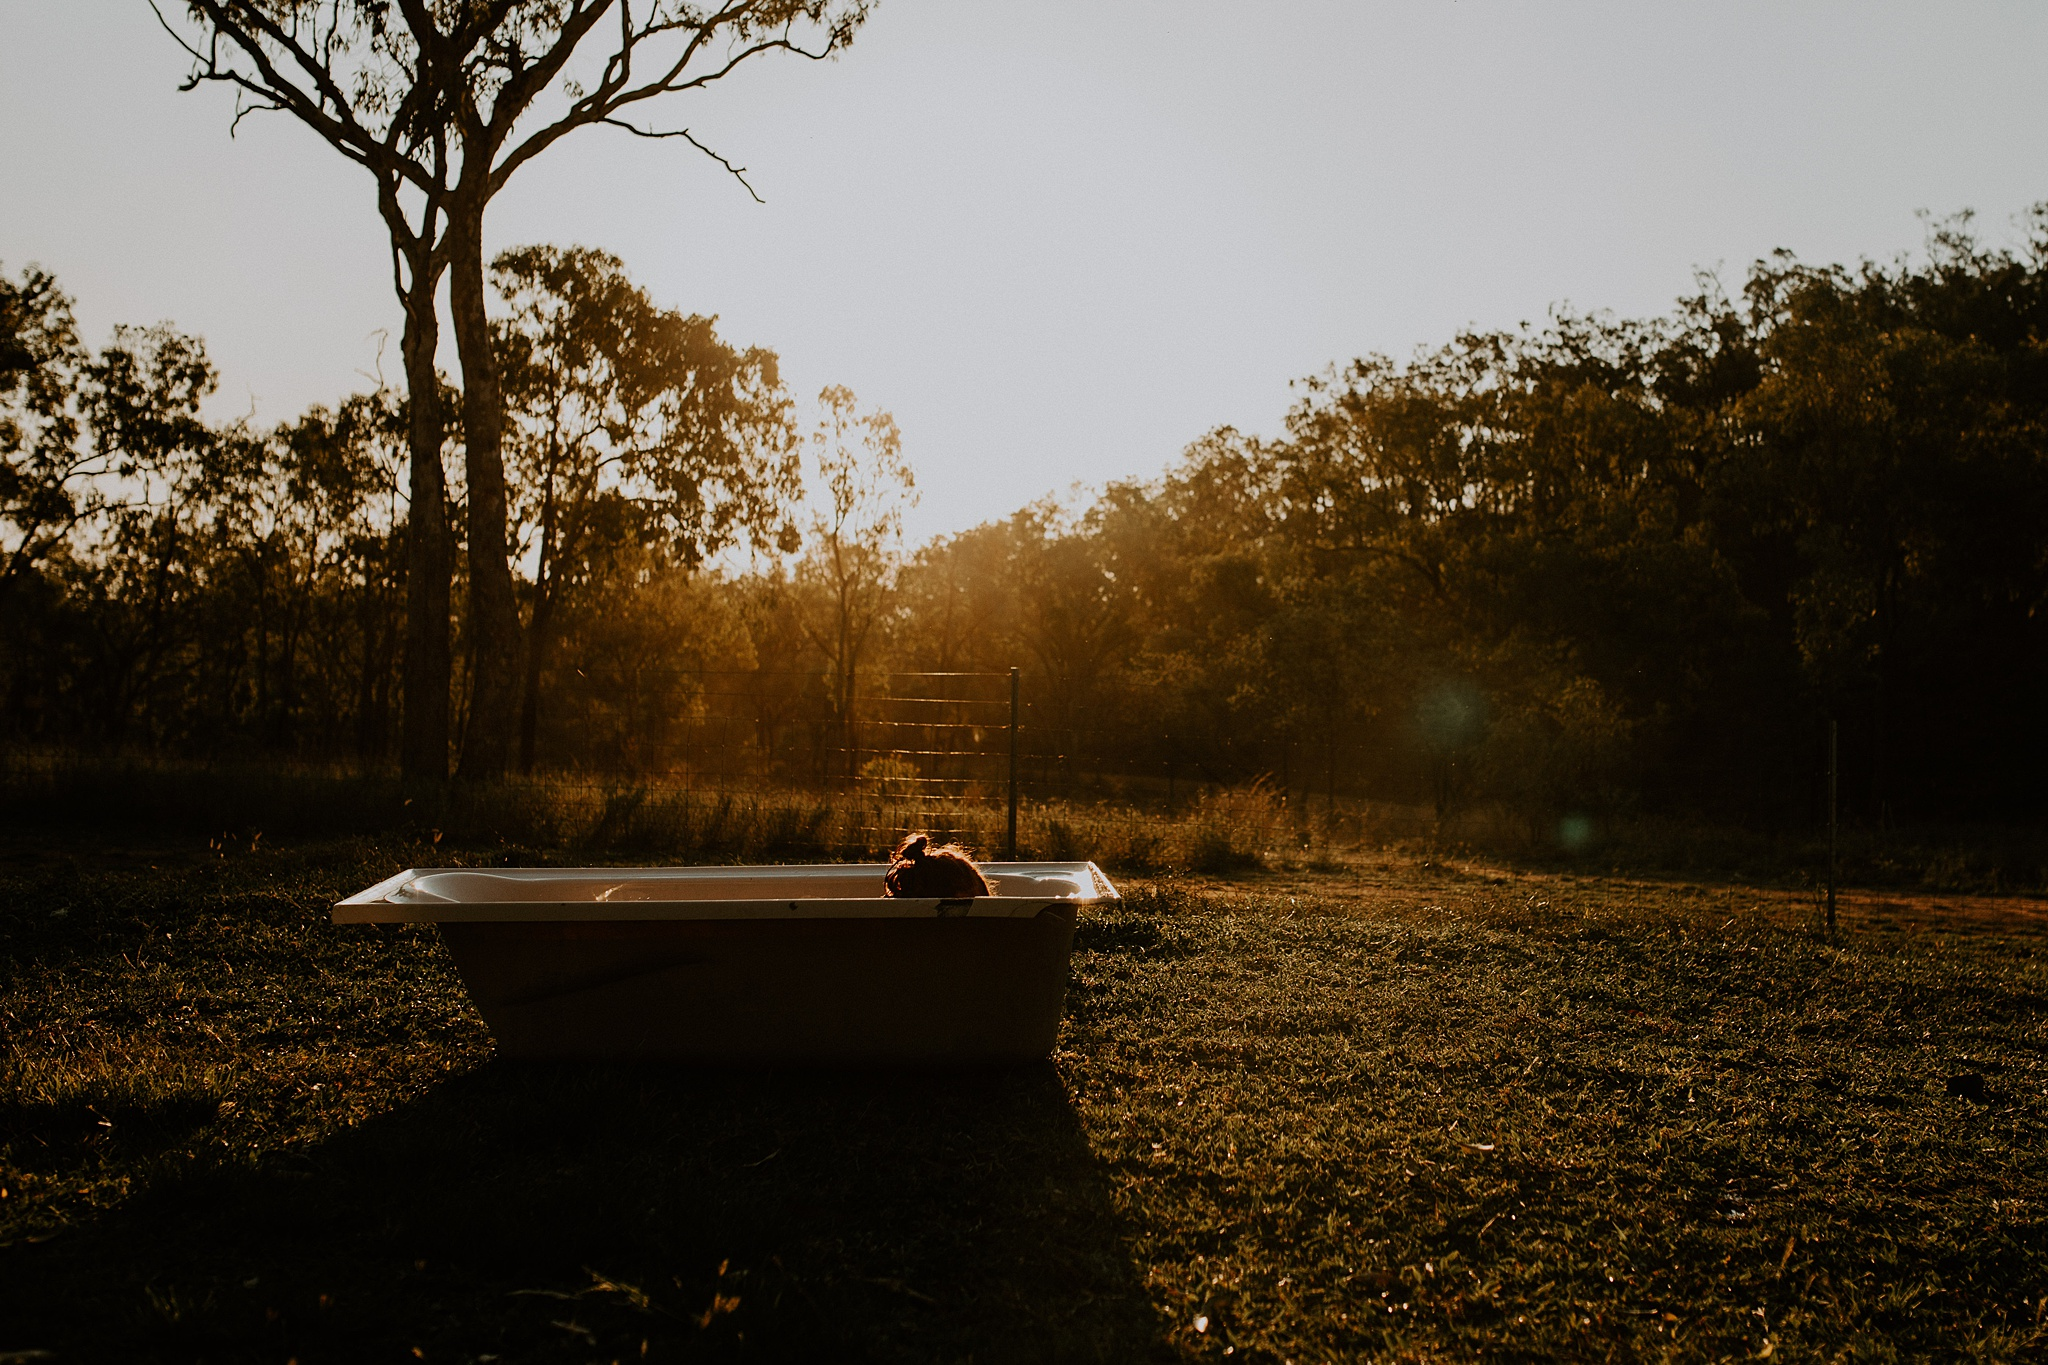 Camilla-French-Townsville-Cairns-Mission-Beach-Port-Douglas-Queensland-family-lifestyle-wedding-eleopment-photographer_0072.jpg